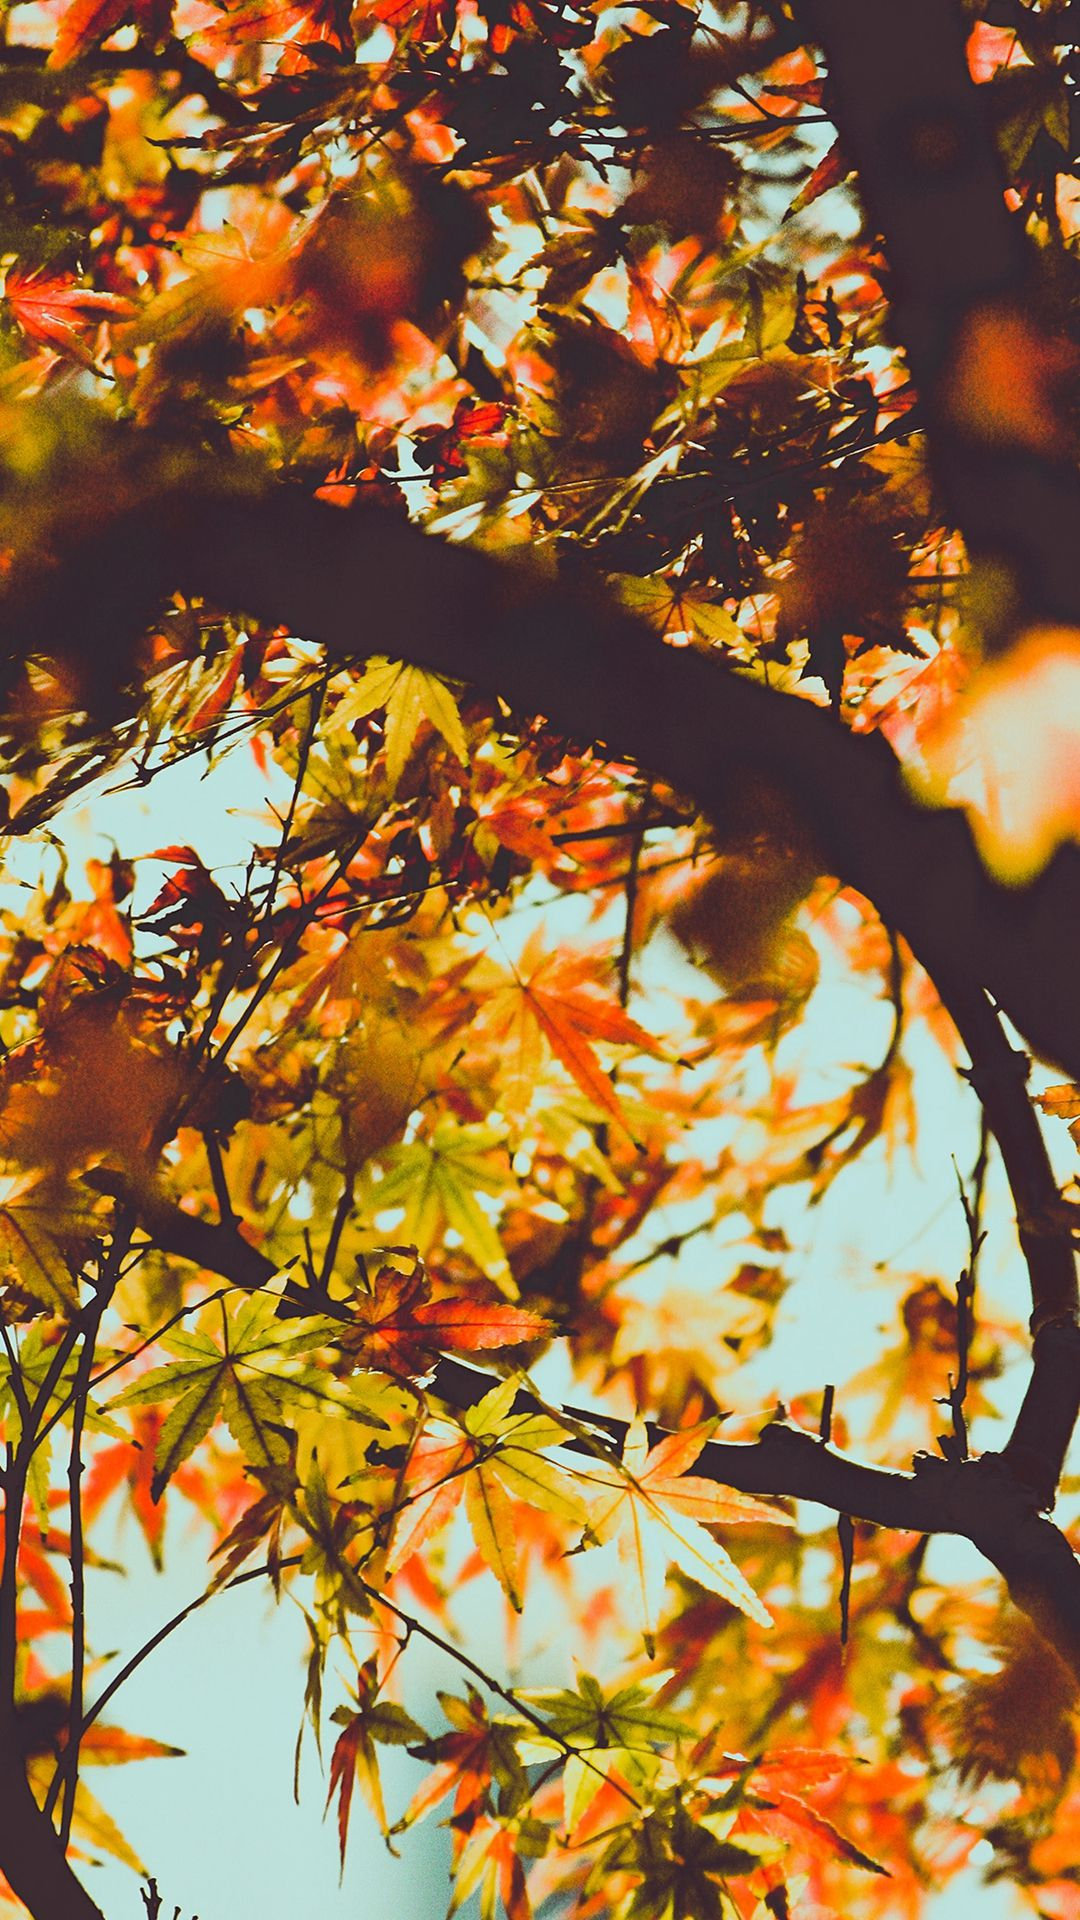 Fall Tree Leaf Autumn Nature Mountain Iphone 6 Wallpaper Fall Wallpaper Iphone Wallpaper Green Live Wallpaper Iphone